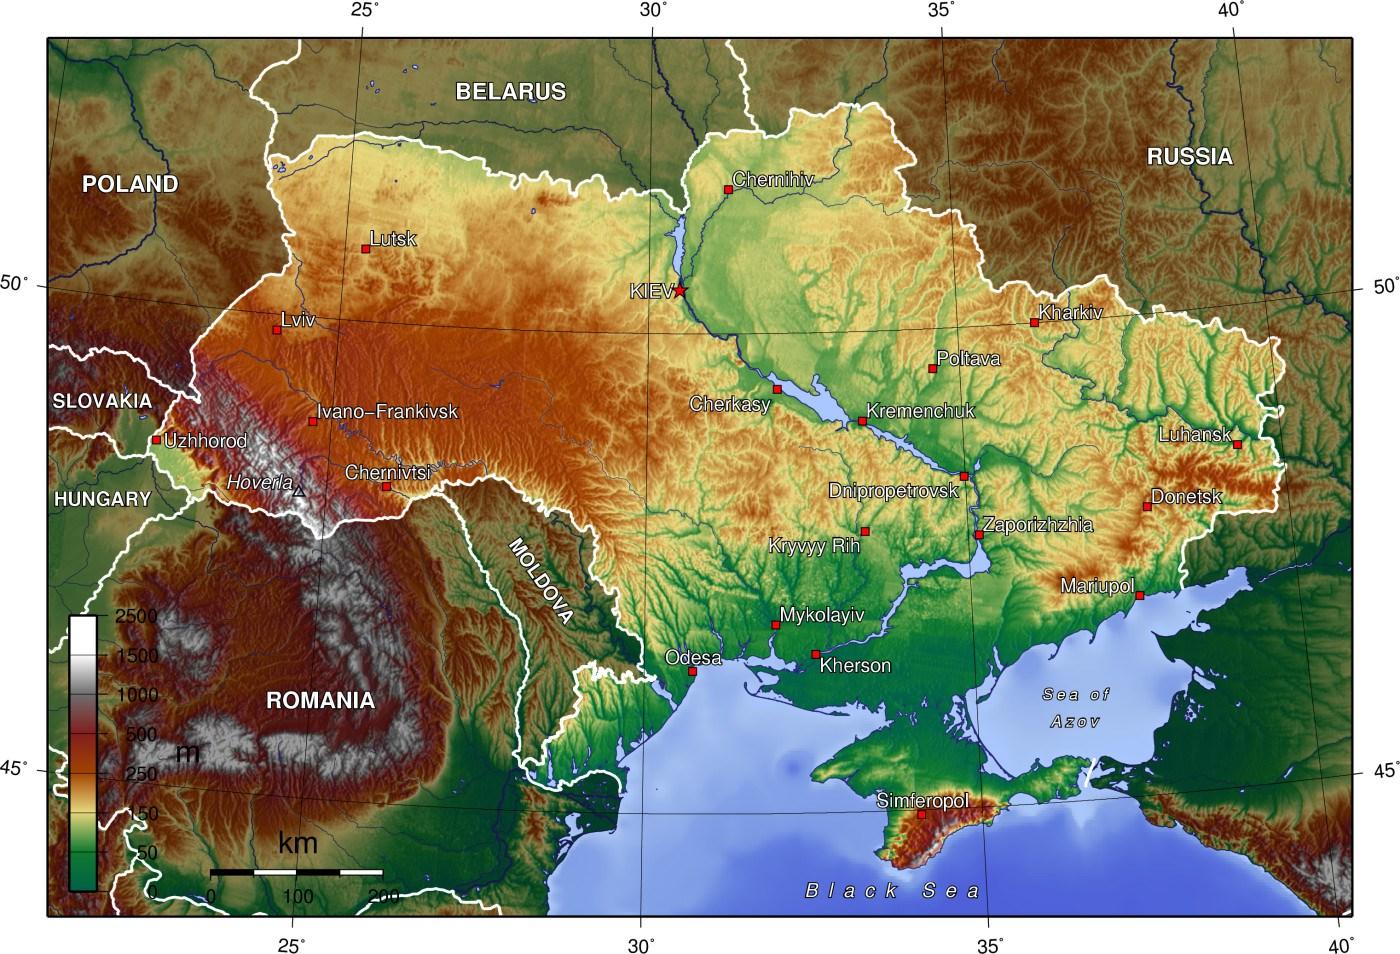 Crimea Map Geopolitics South Russia Liberia Map - Crimea map geopolitics south russia